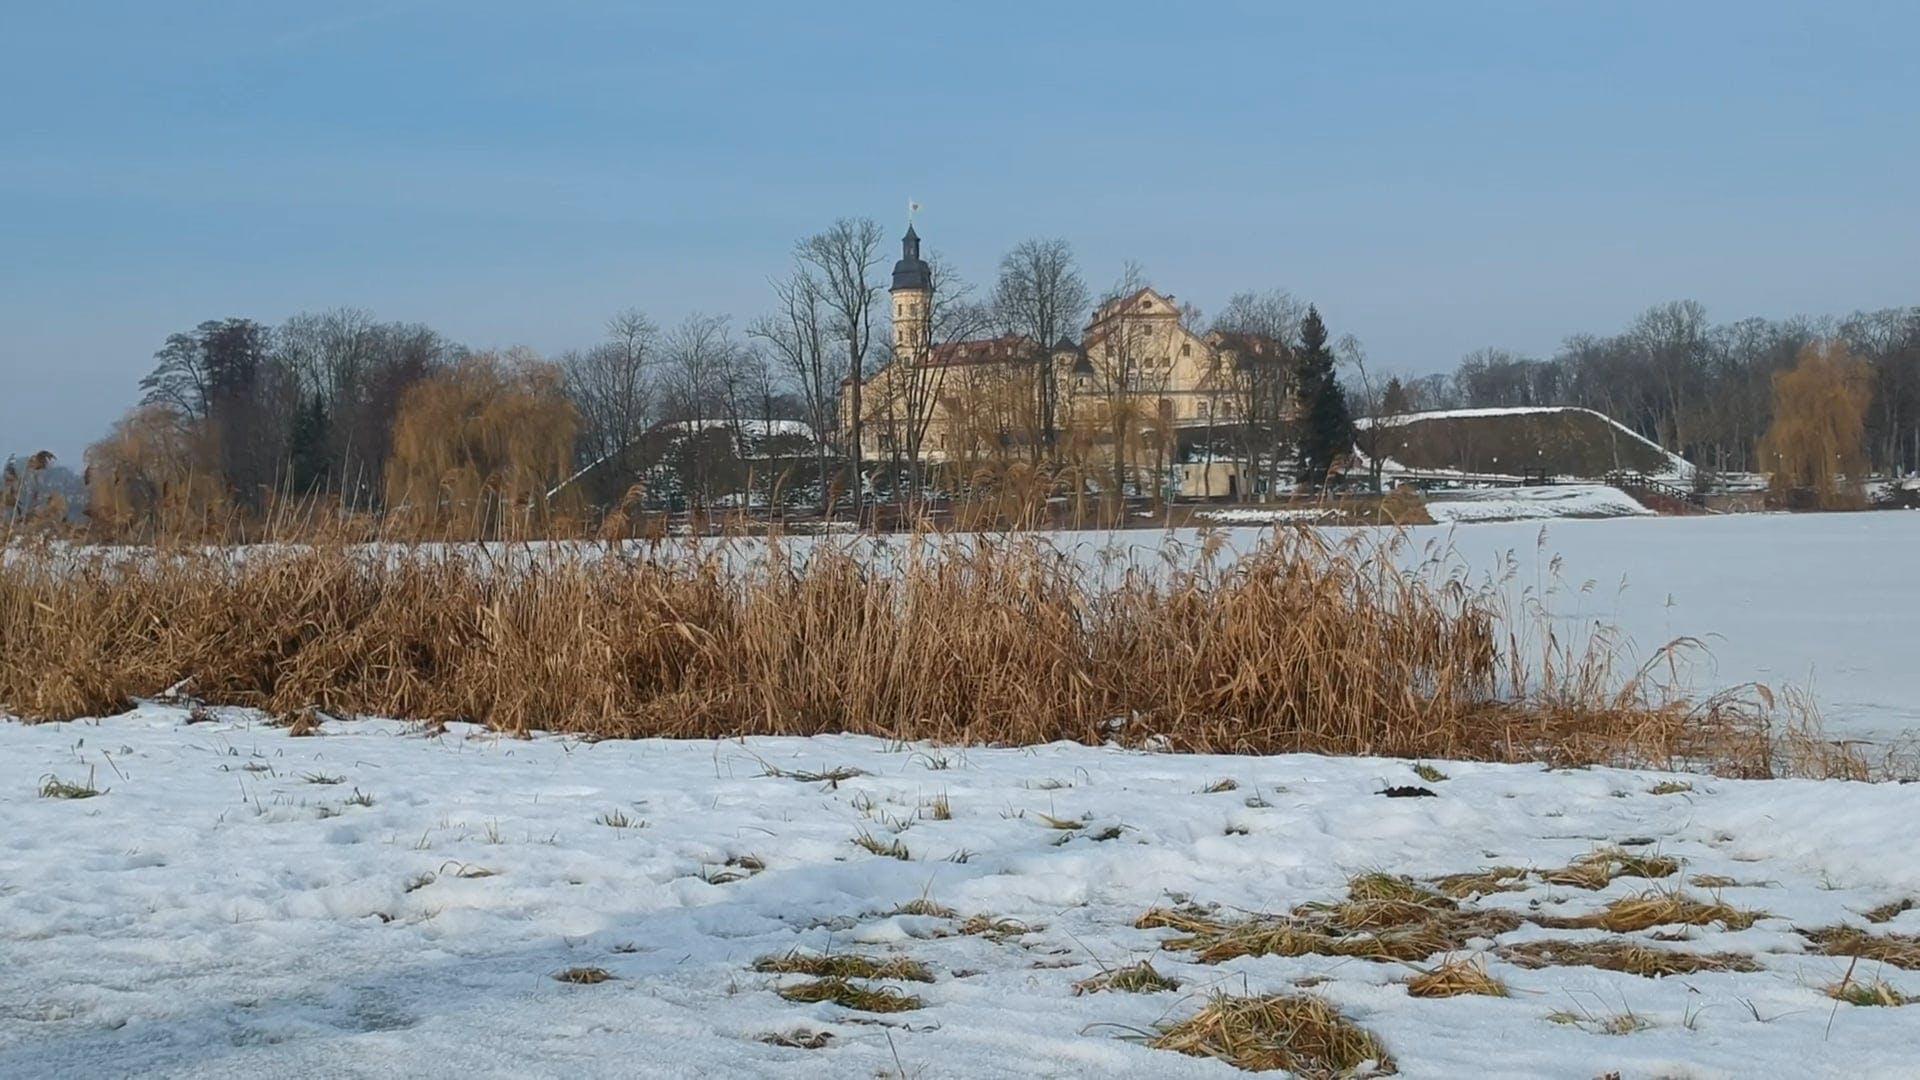 Mansion In A Winter Landscape